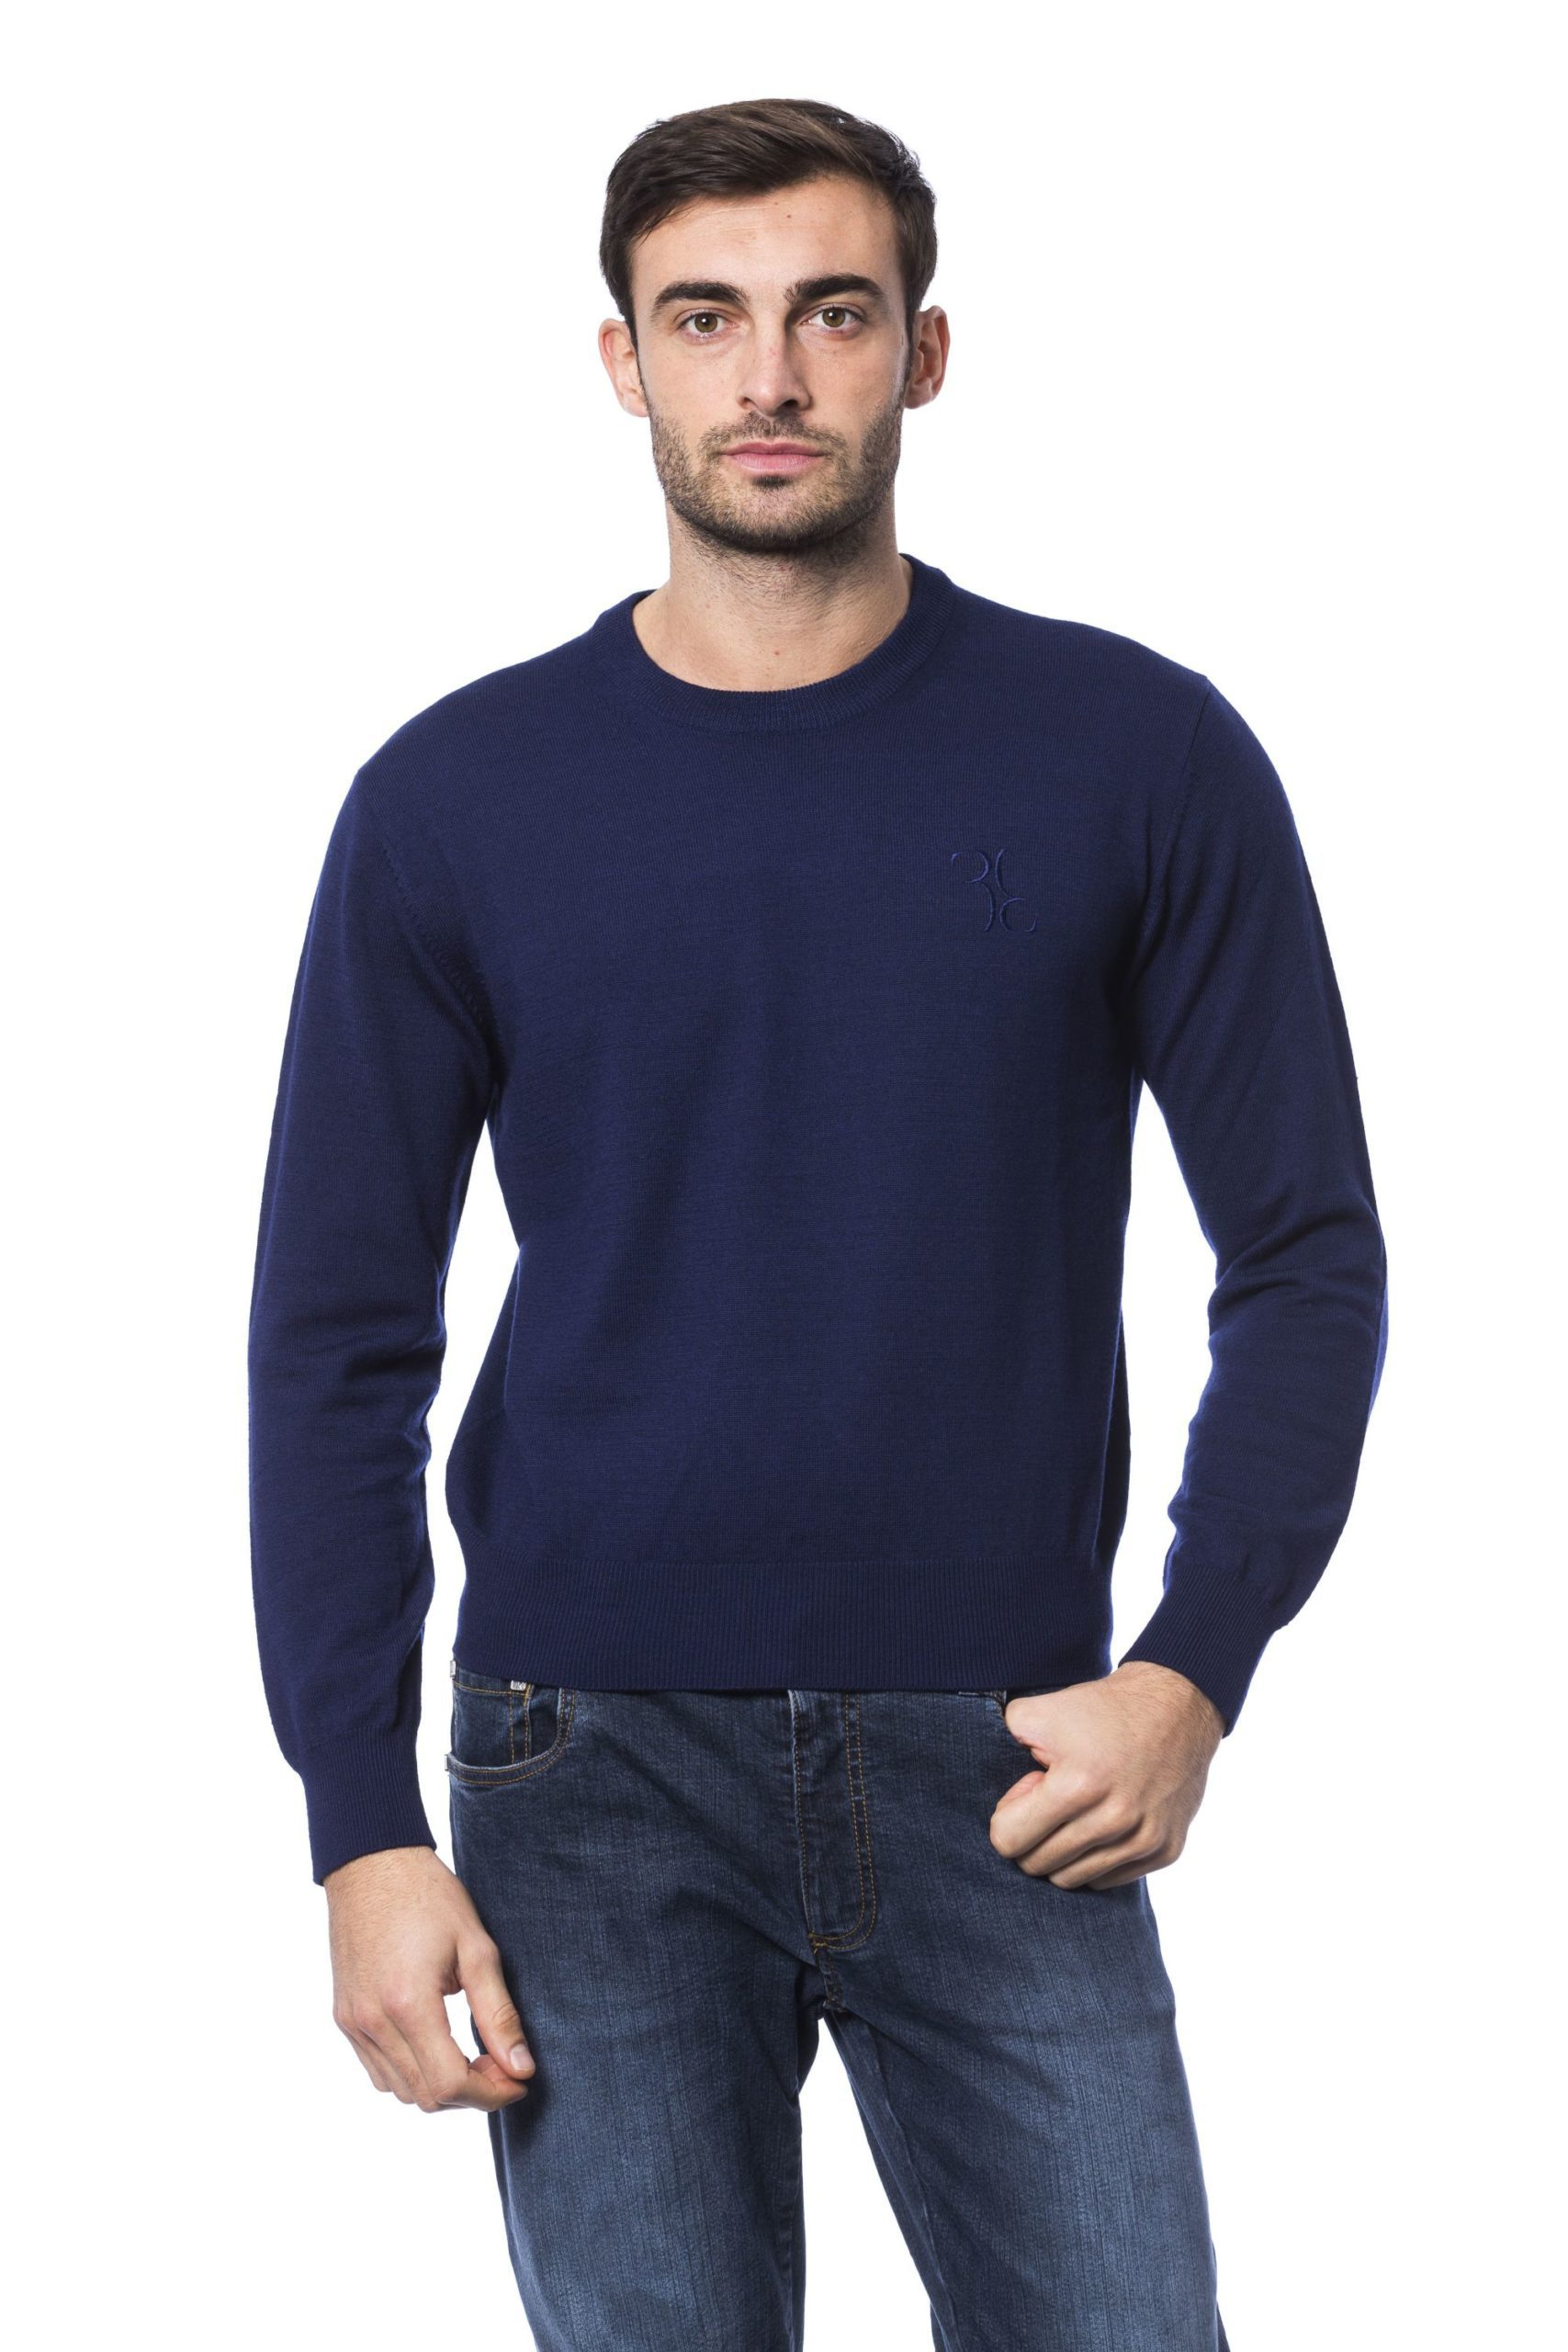 Billionaire Italian Couture Men's Sweater Blue BI1271803 - L